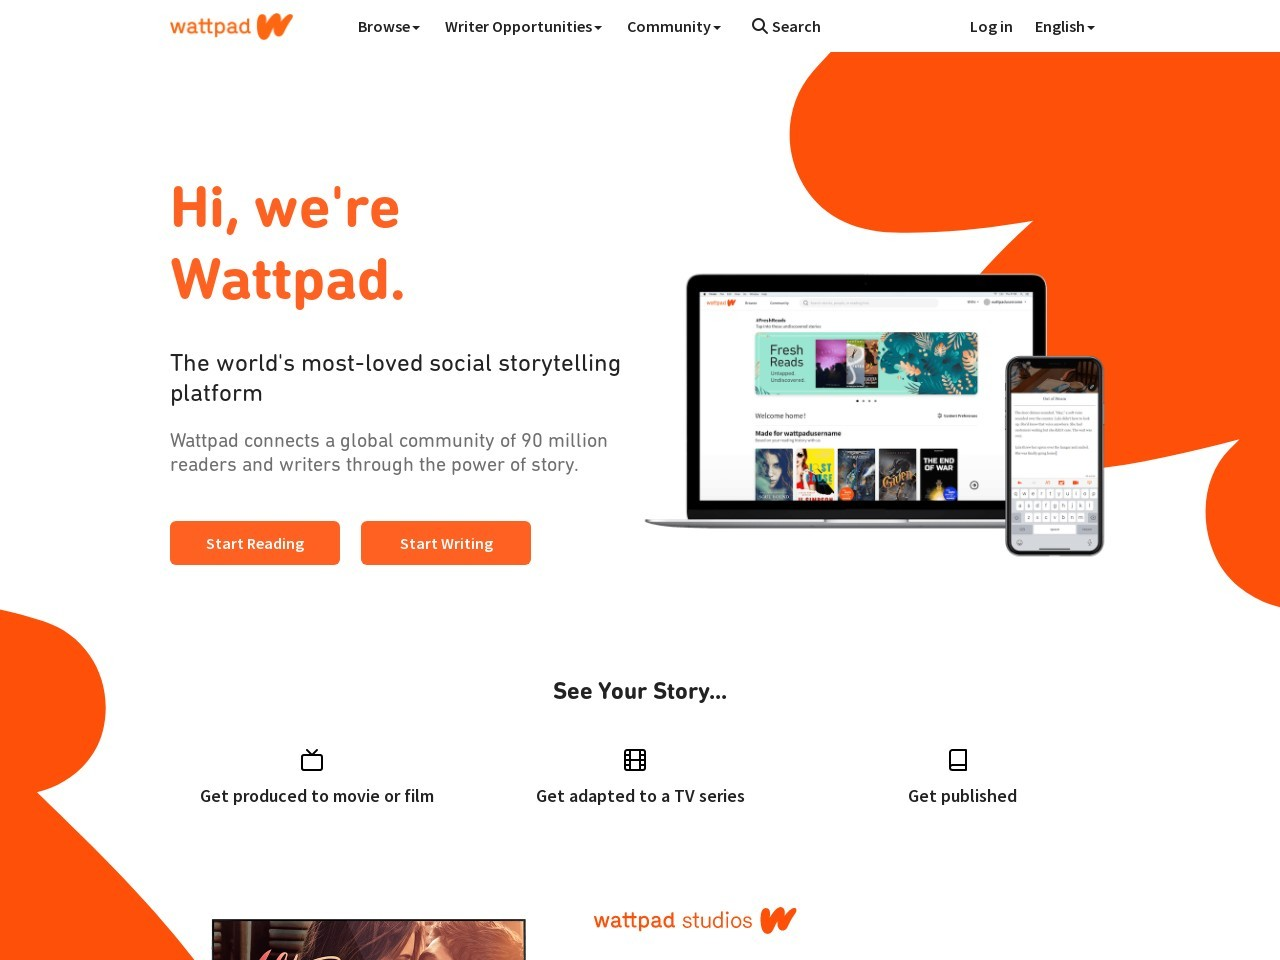 wattpad.com